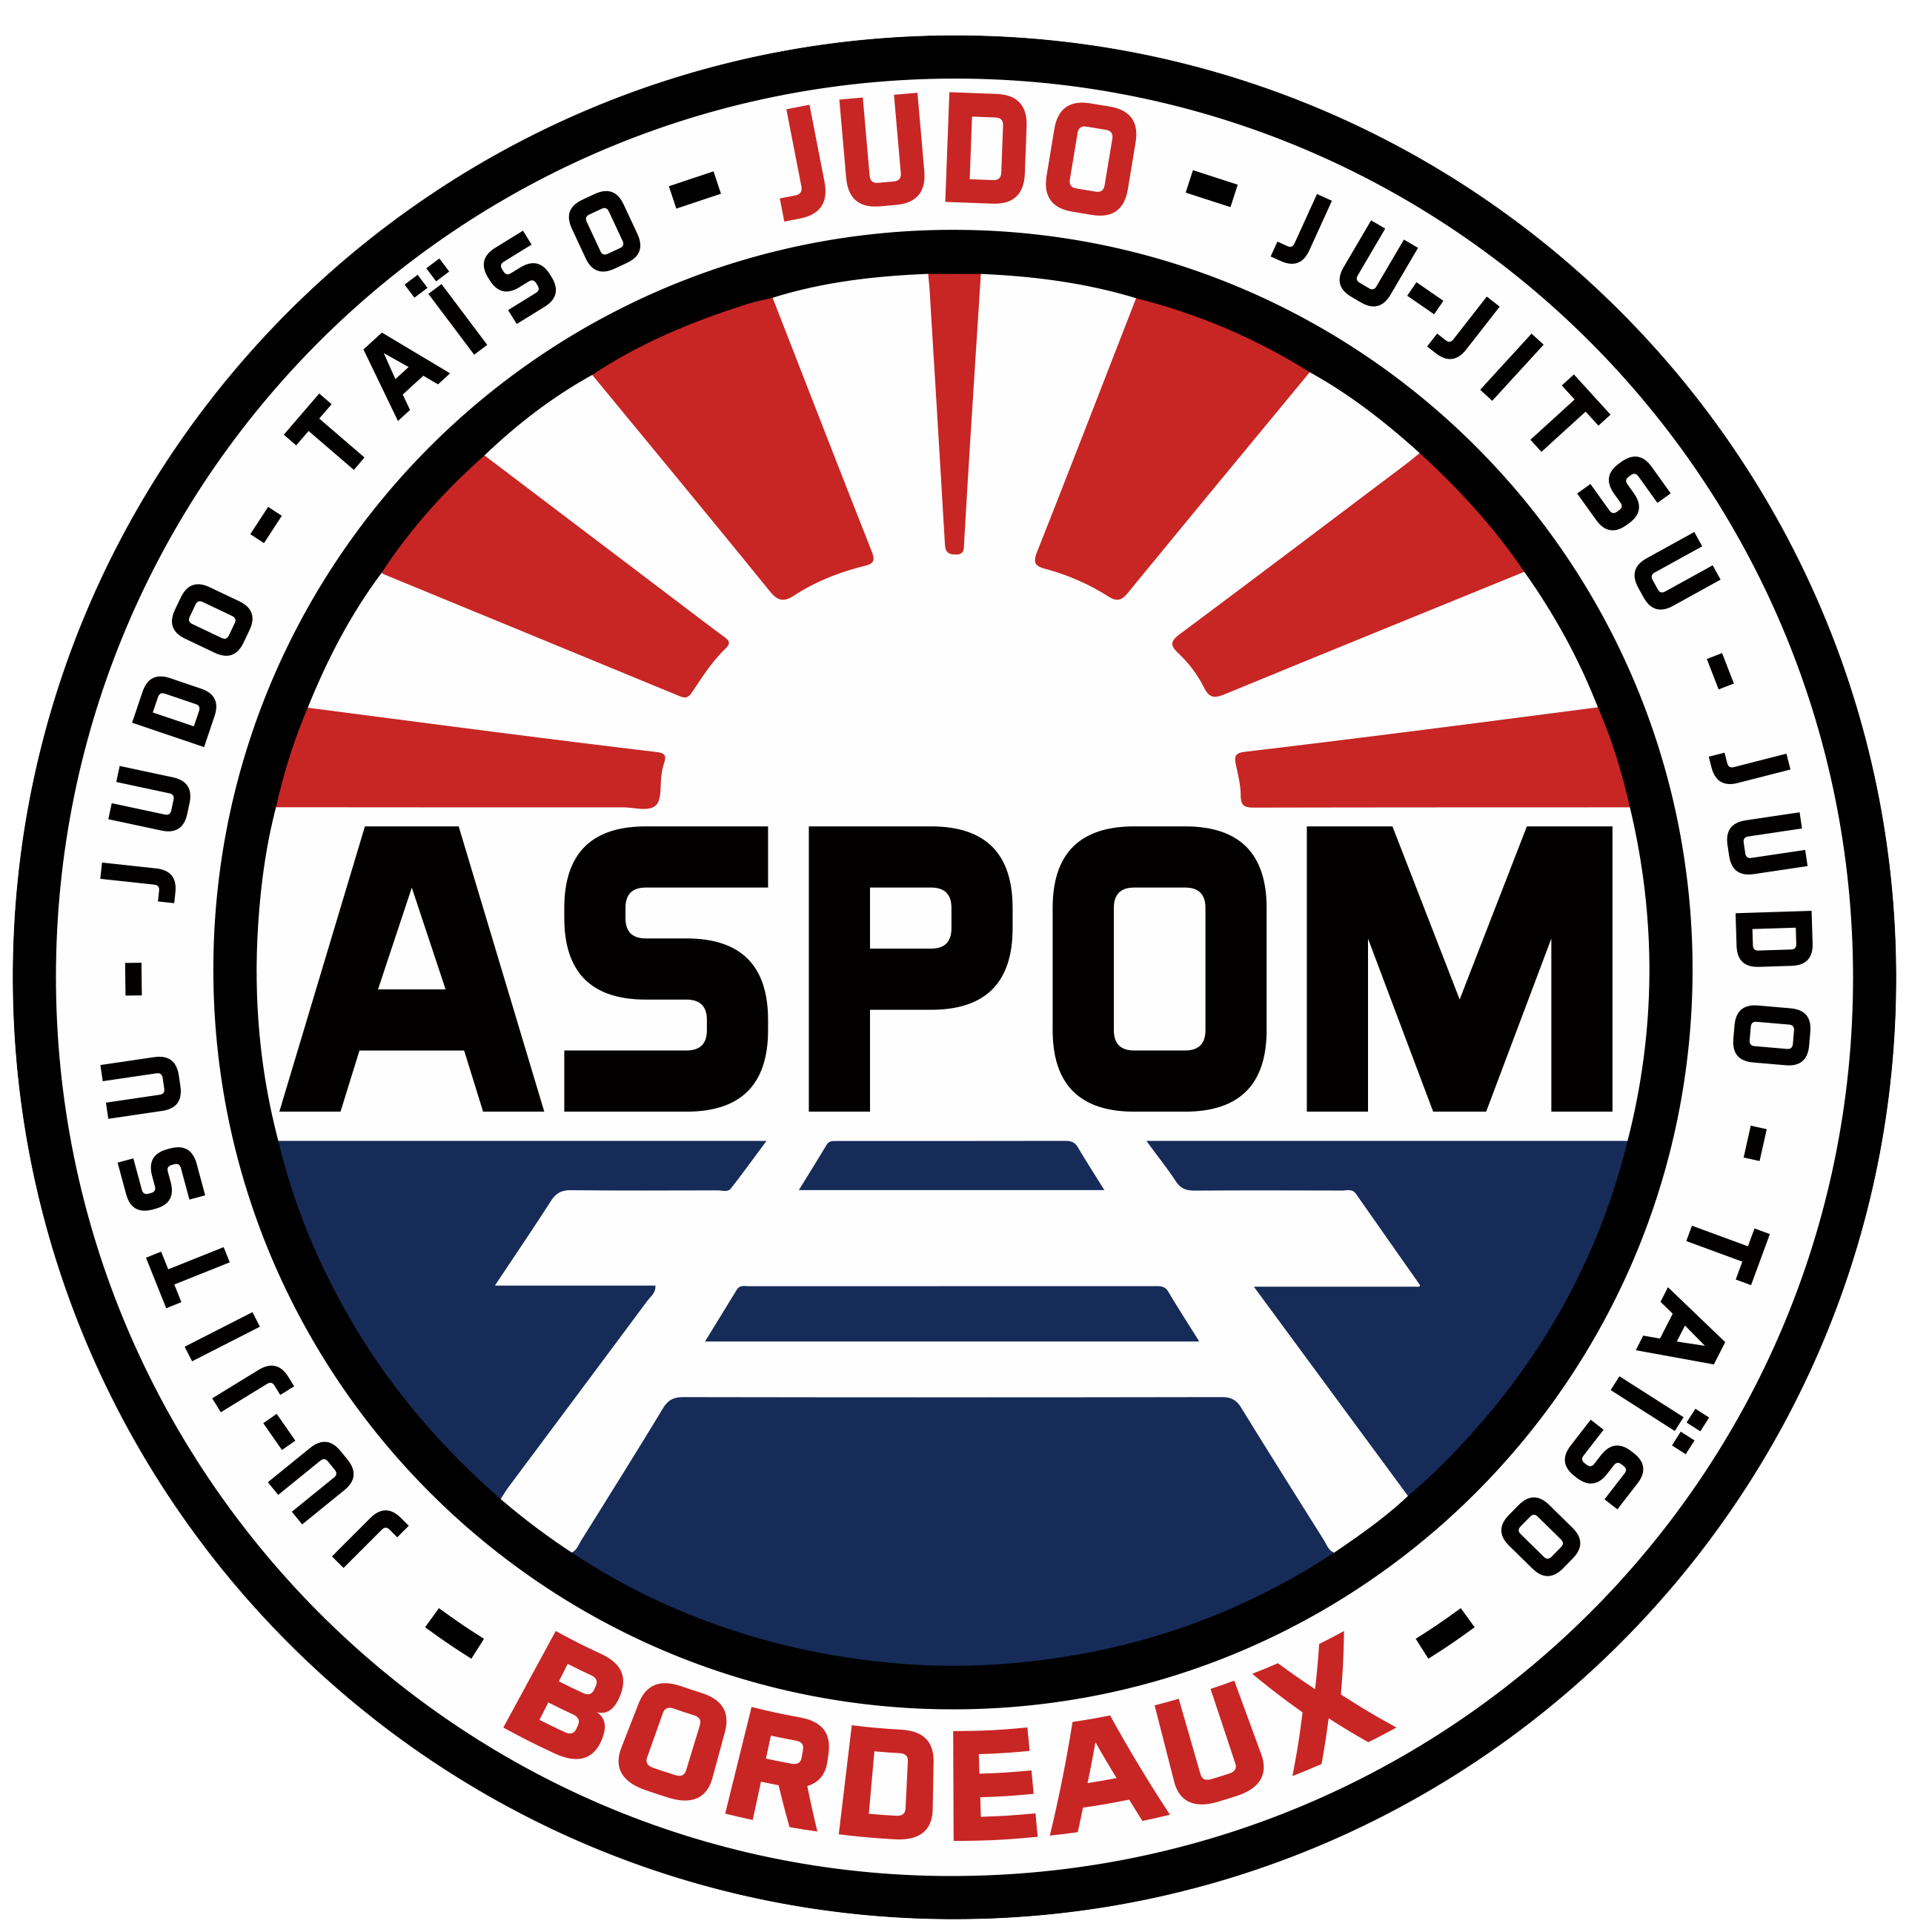 ASPOM Bordeaux Judo